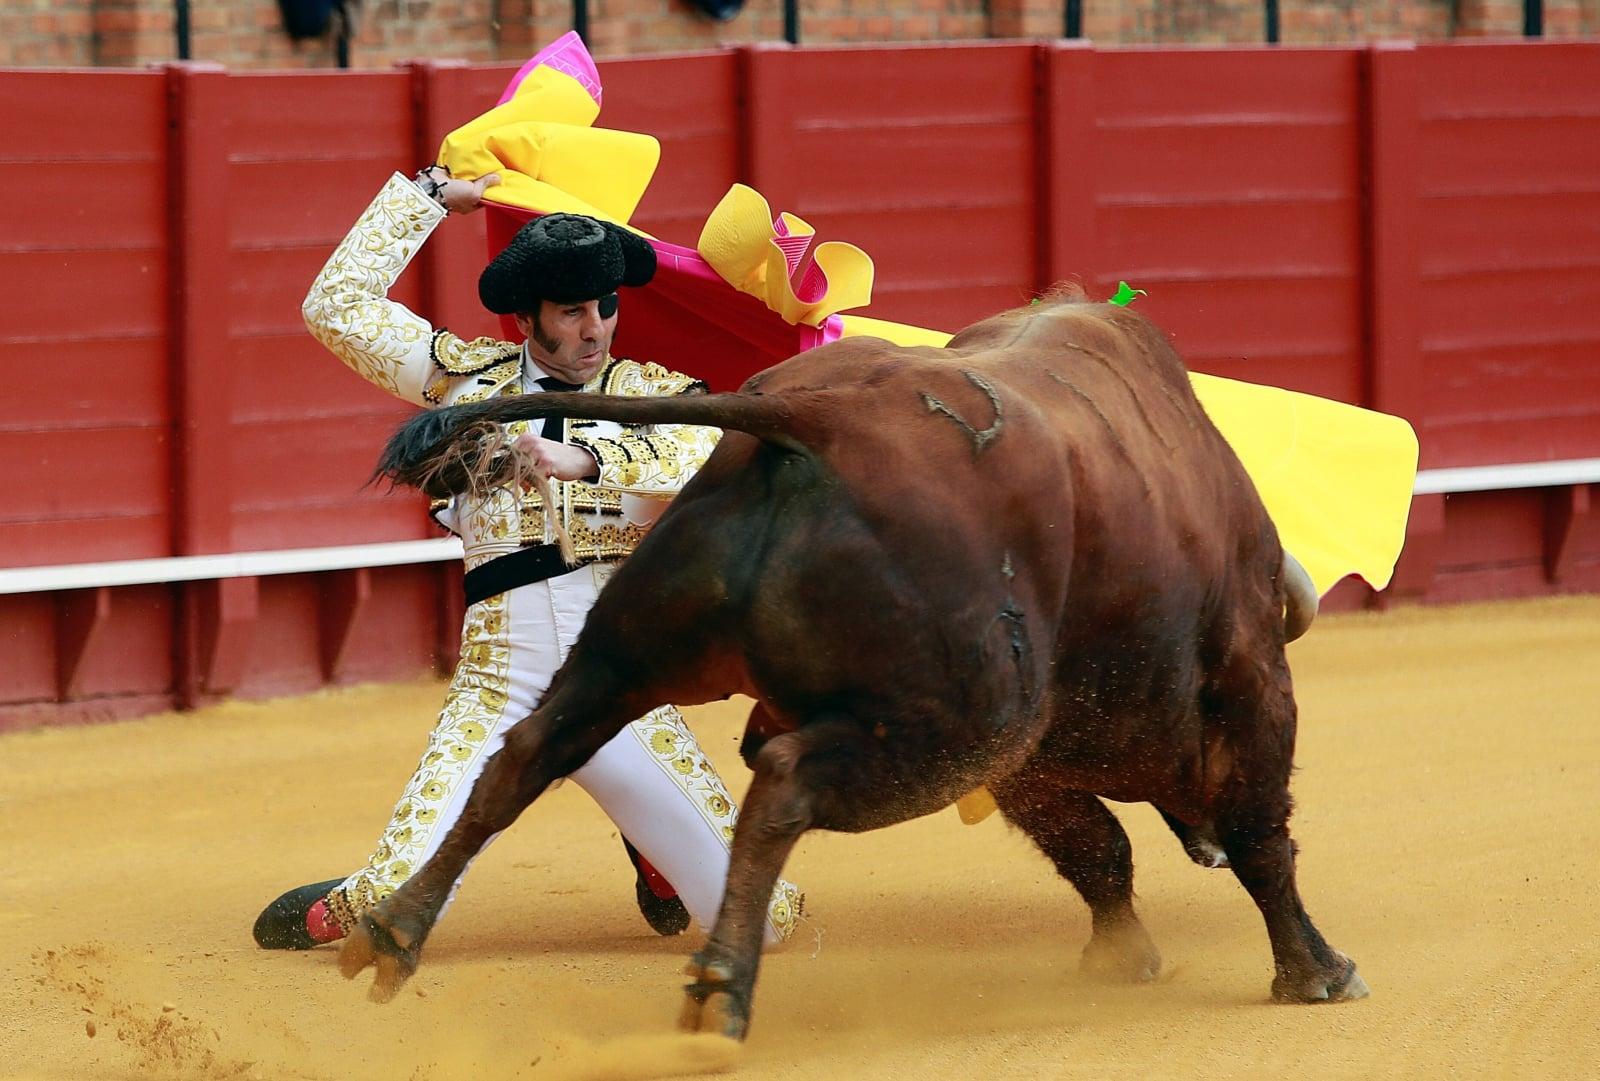 Corrida w Hiszpani fot. EPA/JULIO MUNOZ